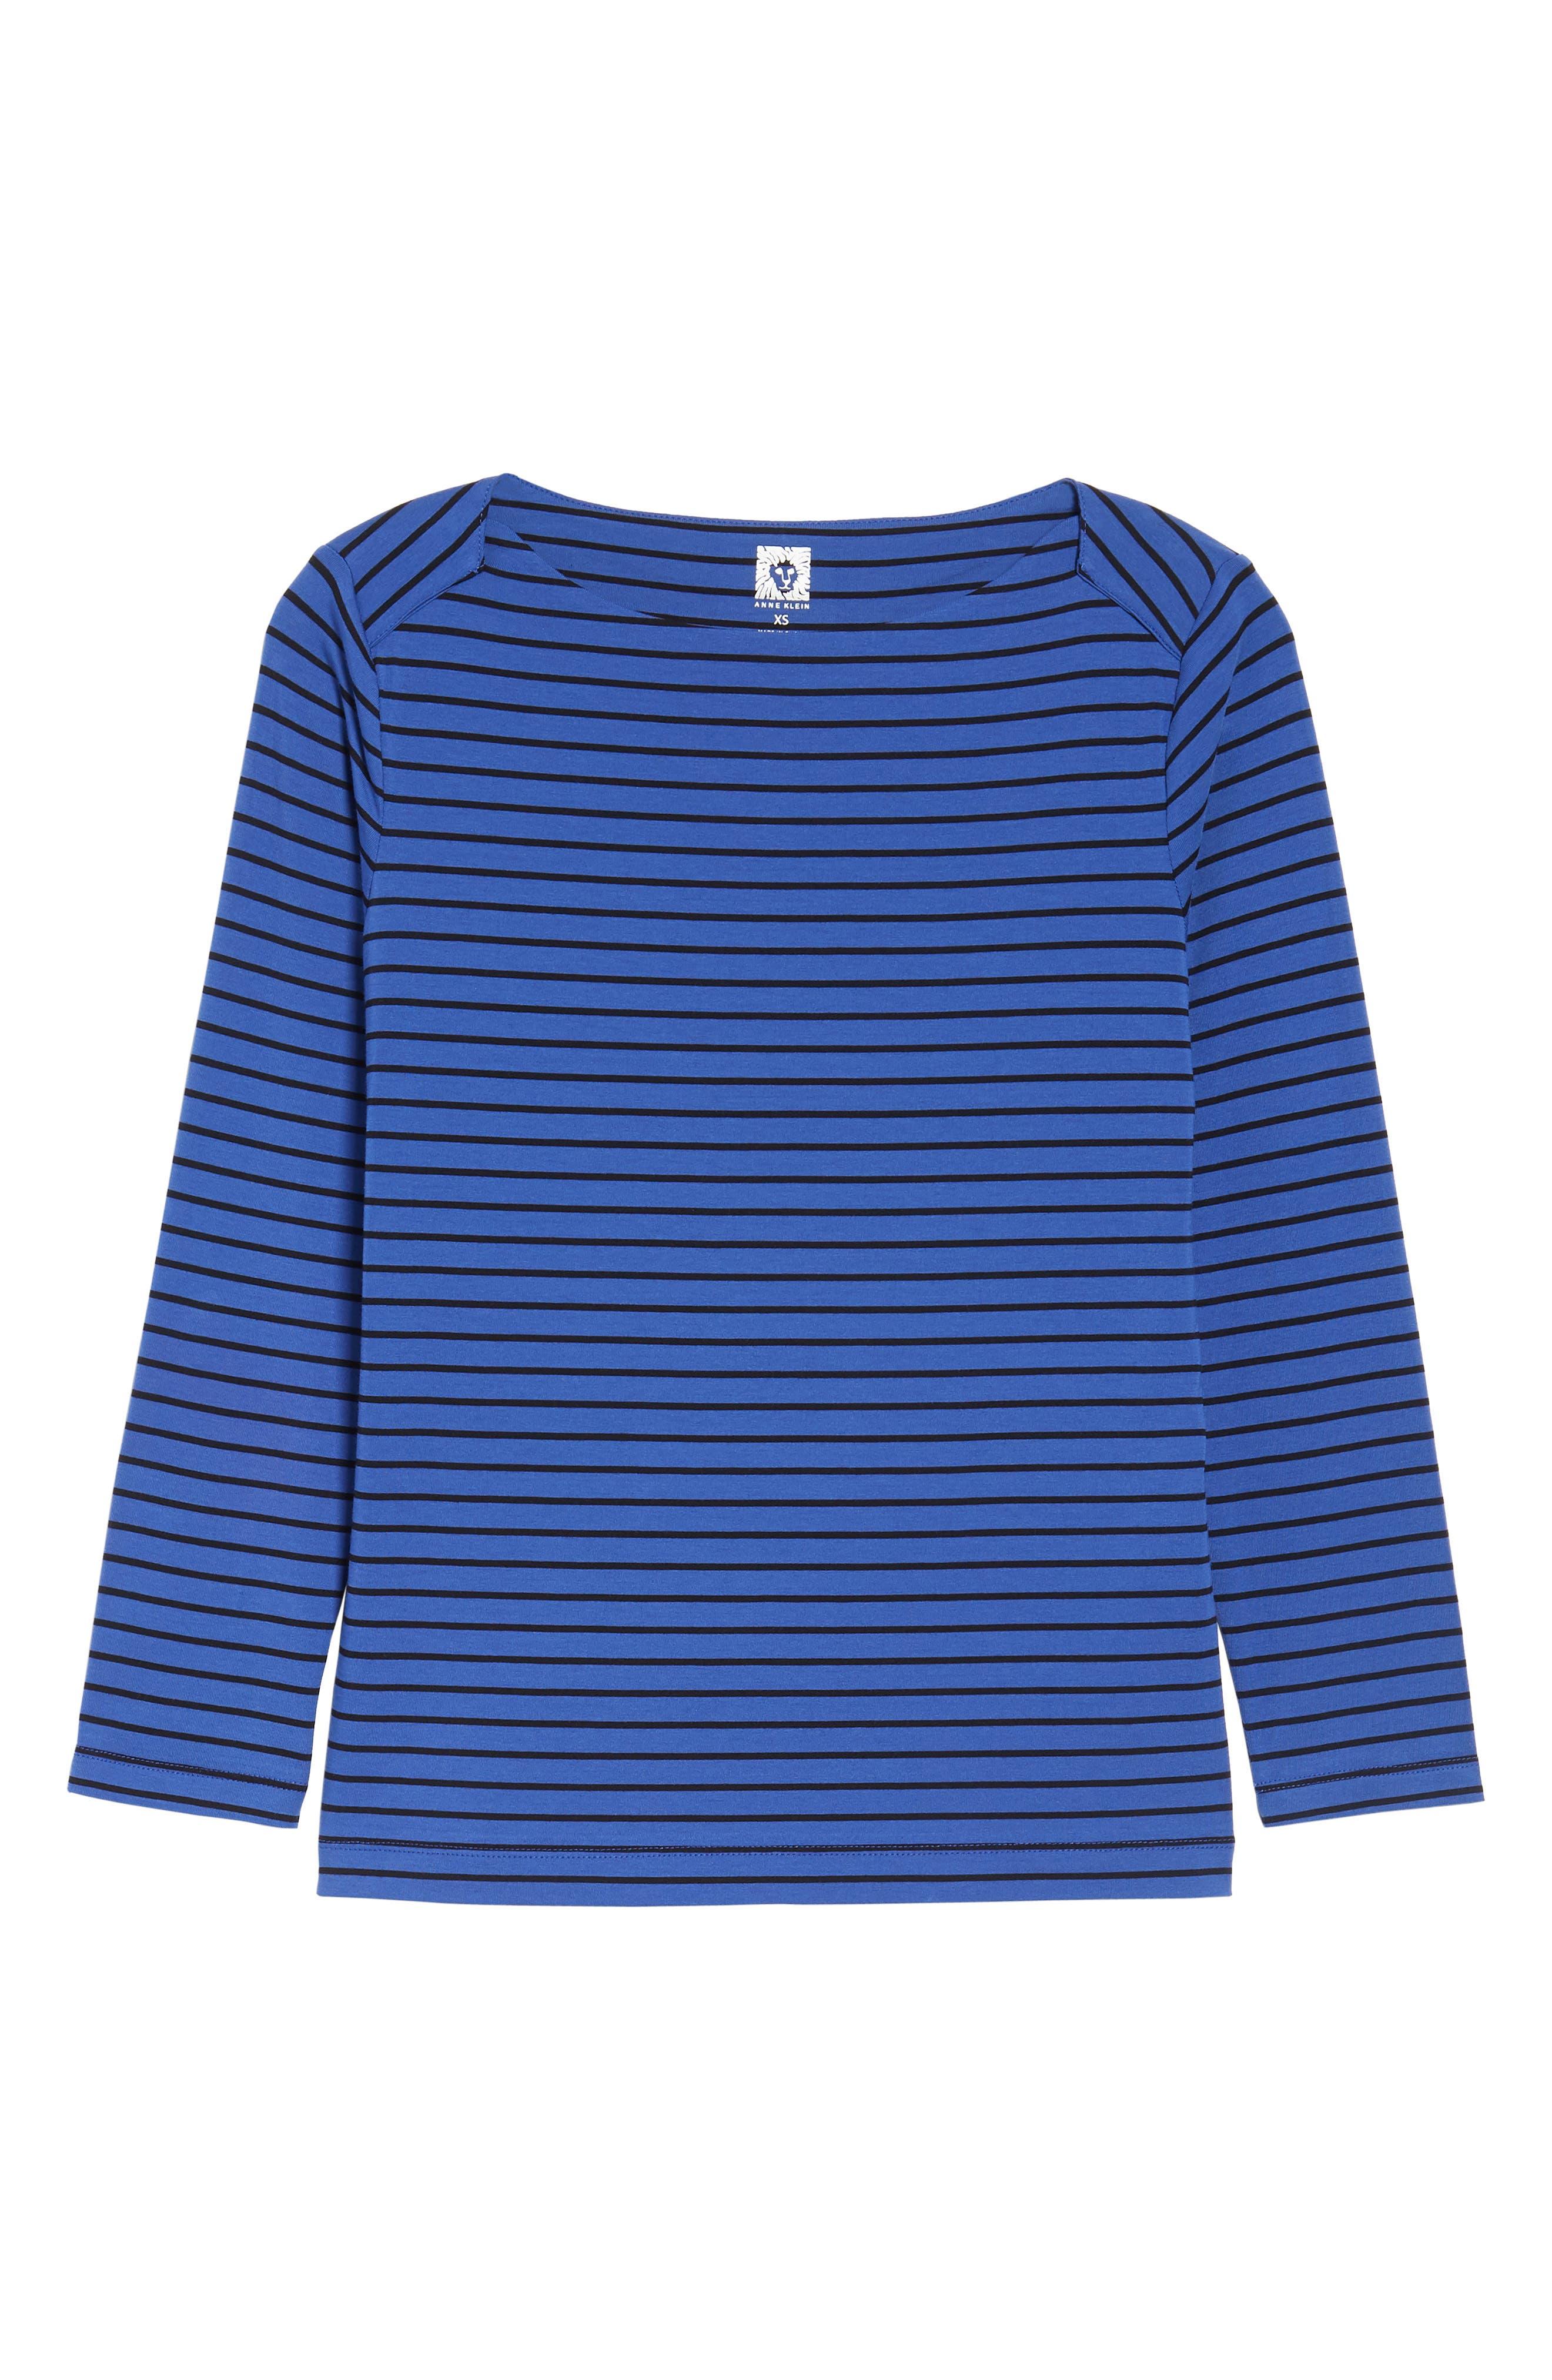 Stripe Knit Boatneck Top,                             Alternate thumbnail 6, color,                             Okeeffe Blue/ Black